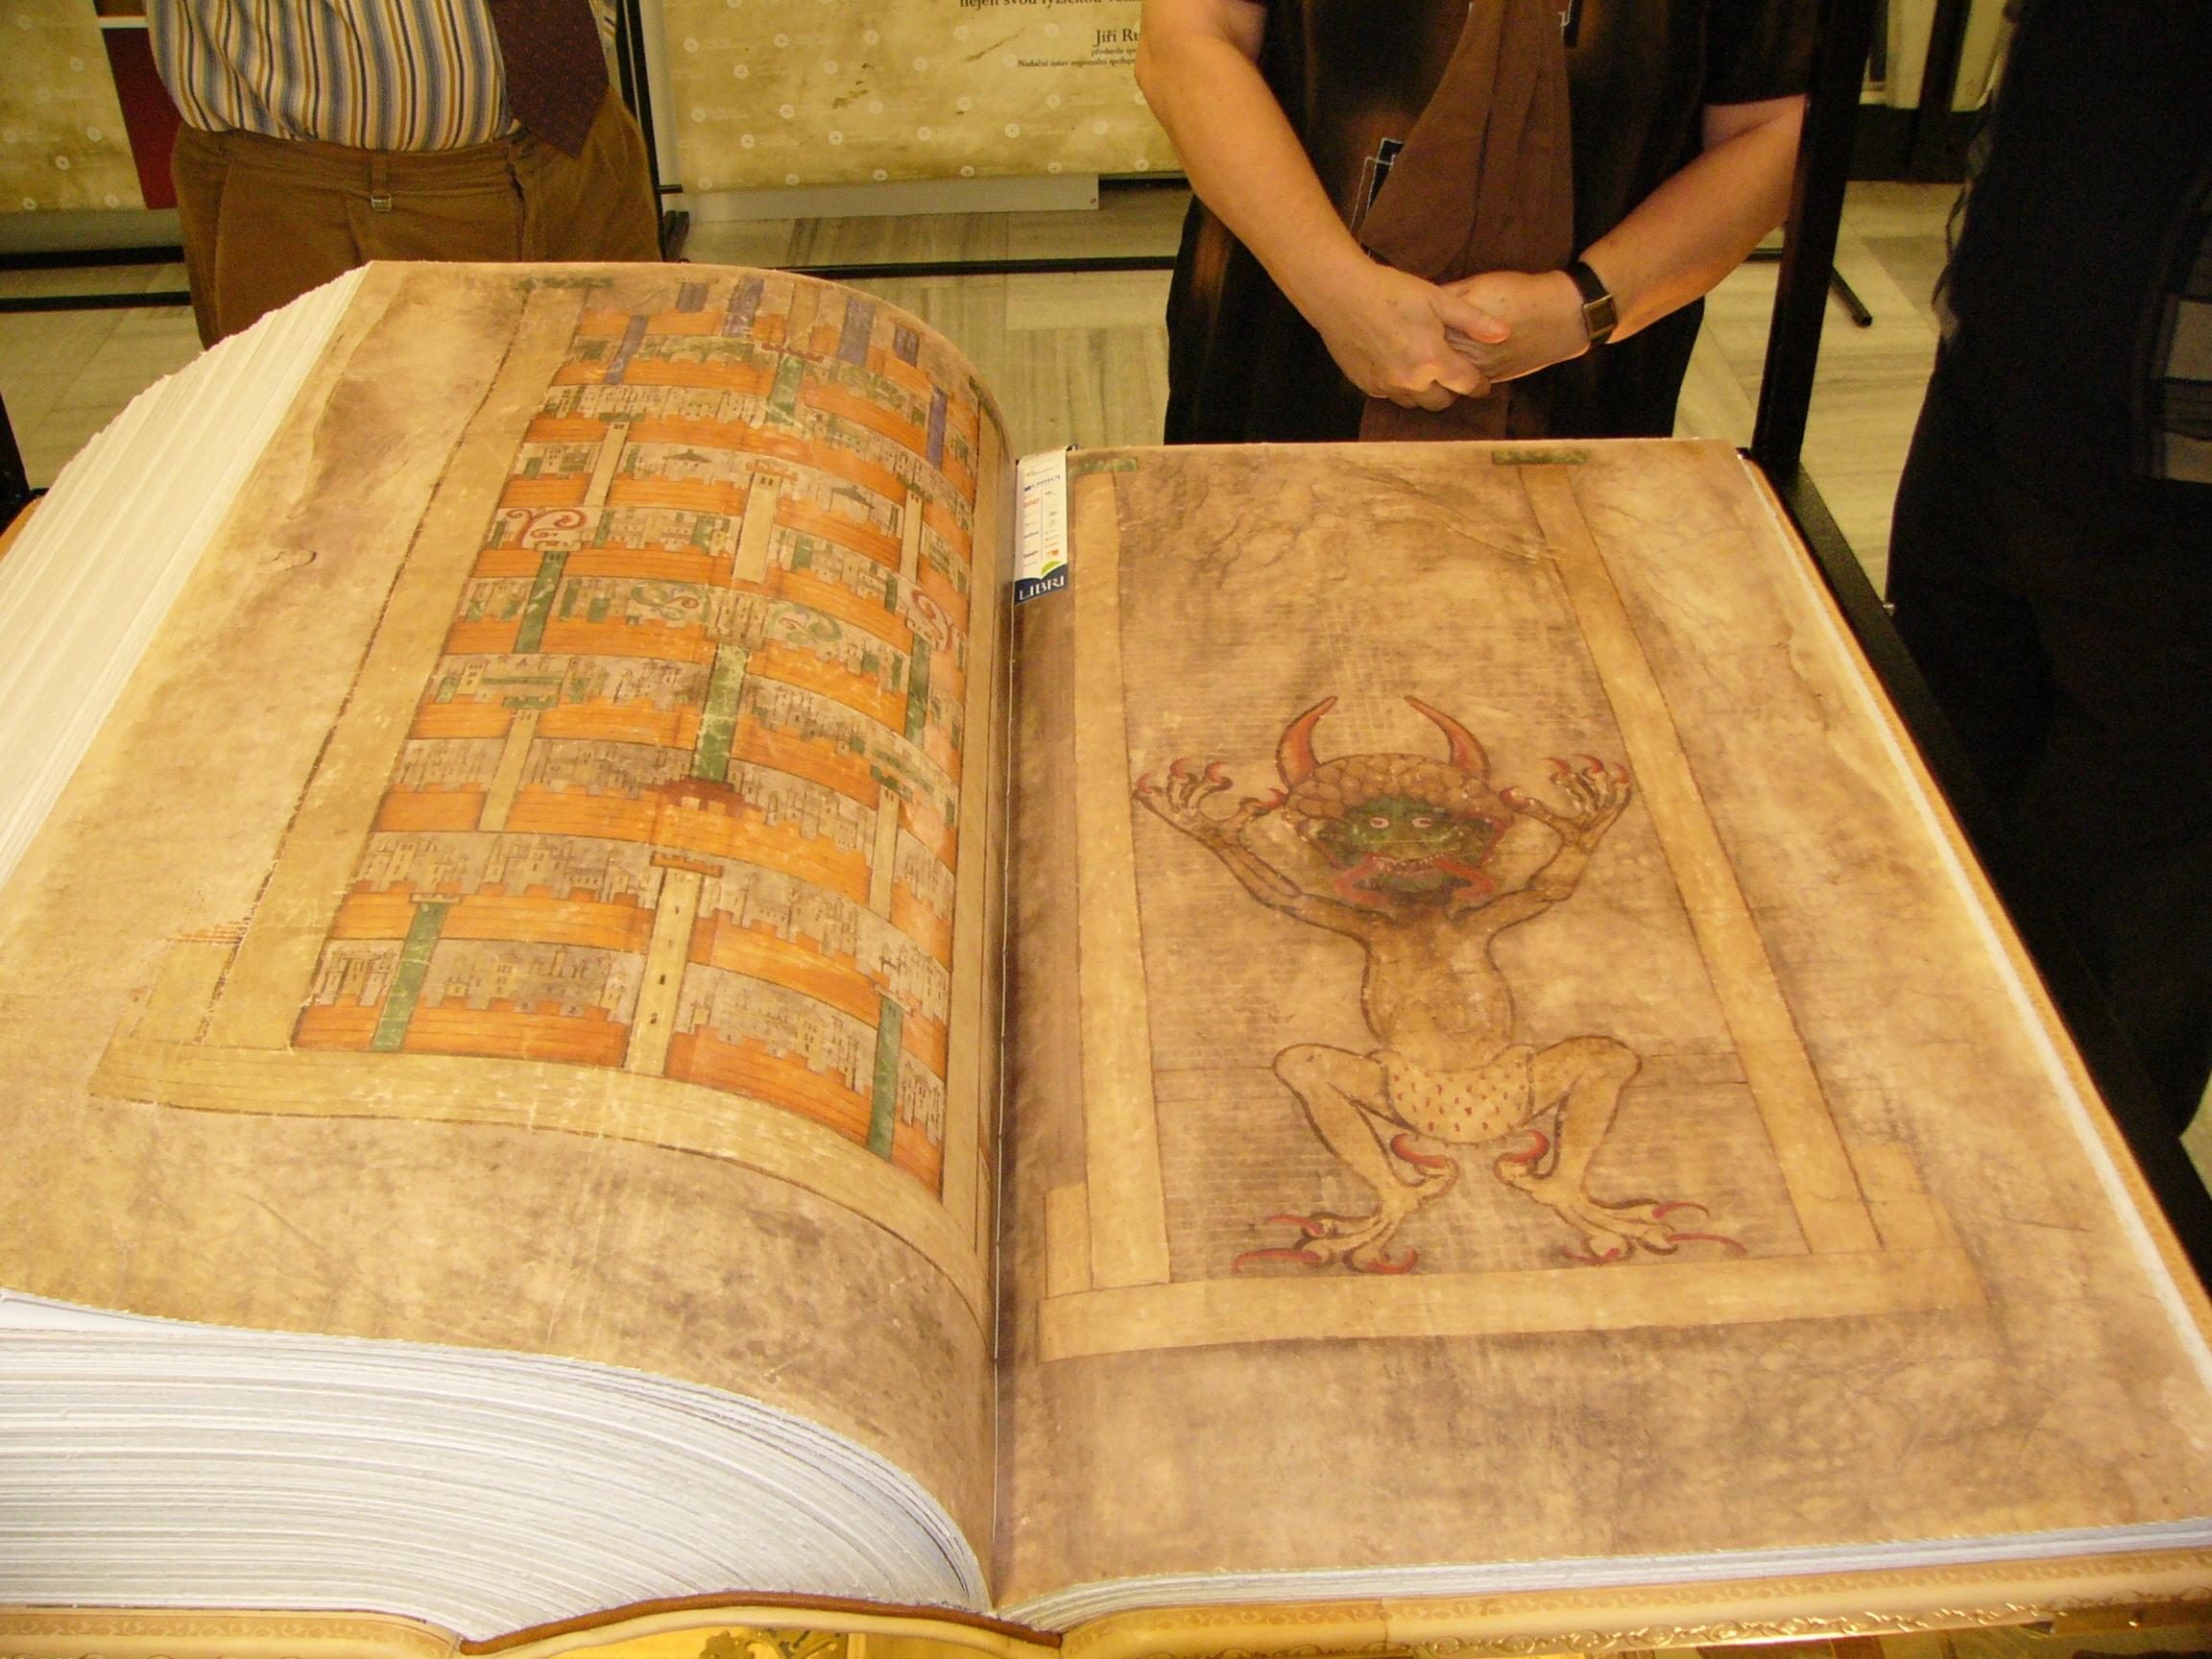 codex-gigas-kinh-quy-du-4